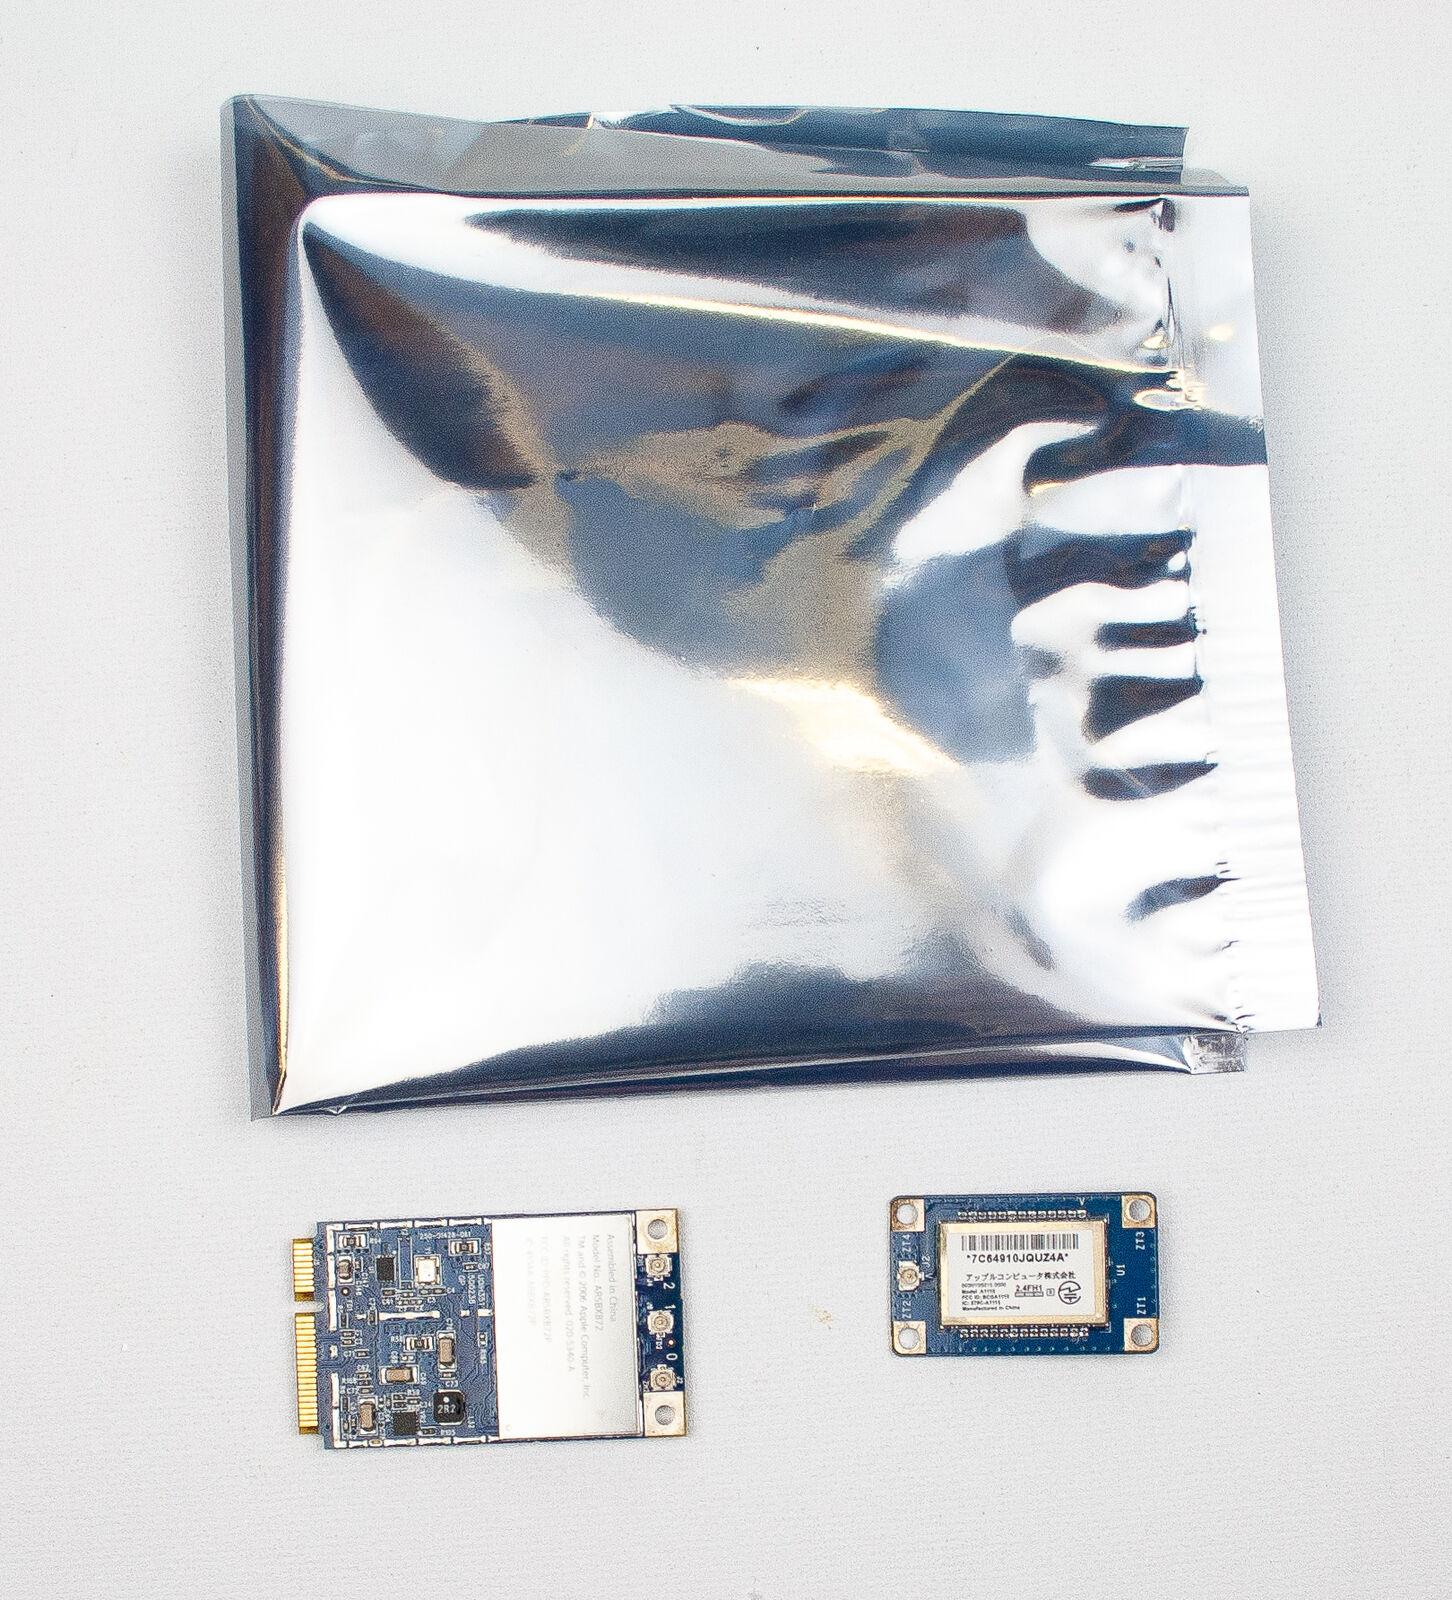 Apple: Bluetooth & WIFI Card - For iMac A1115, Model AR5BXB72